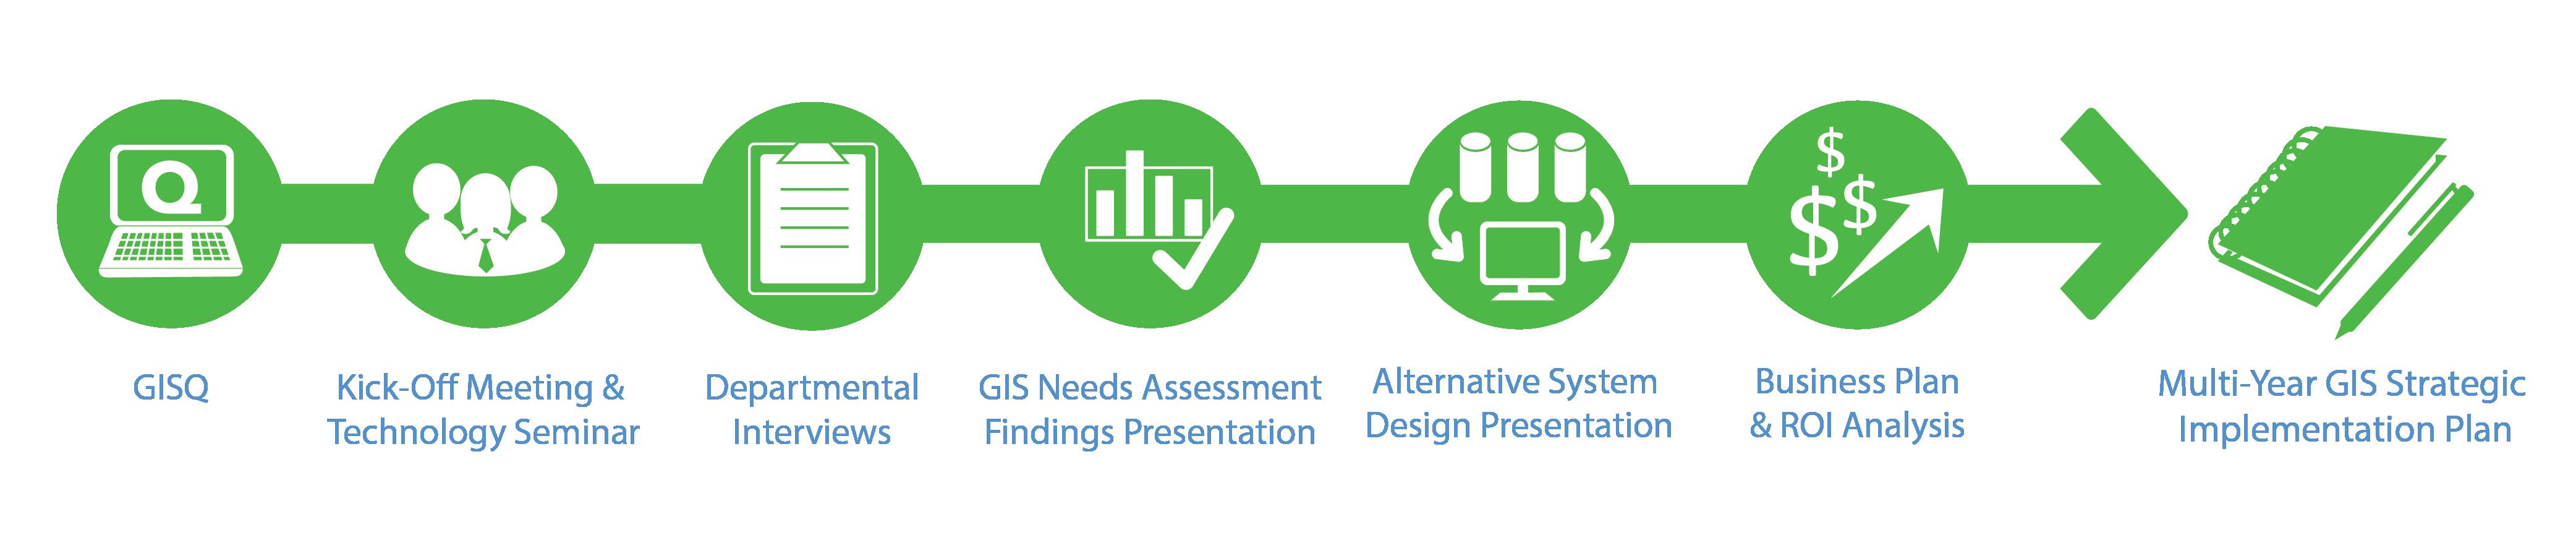 GIS Strategic Planning Methodology for Local Government